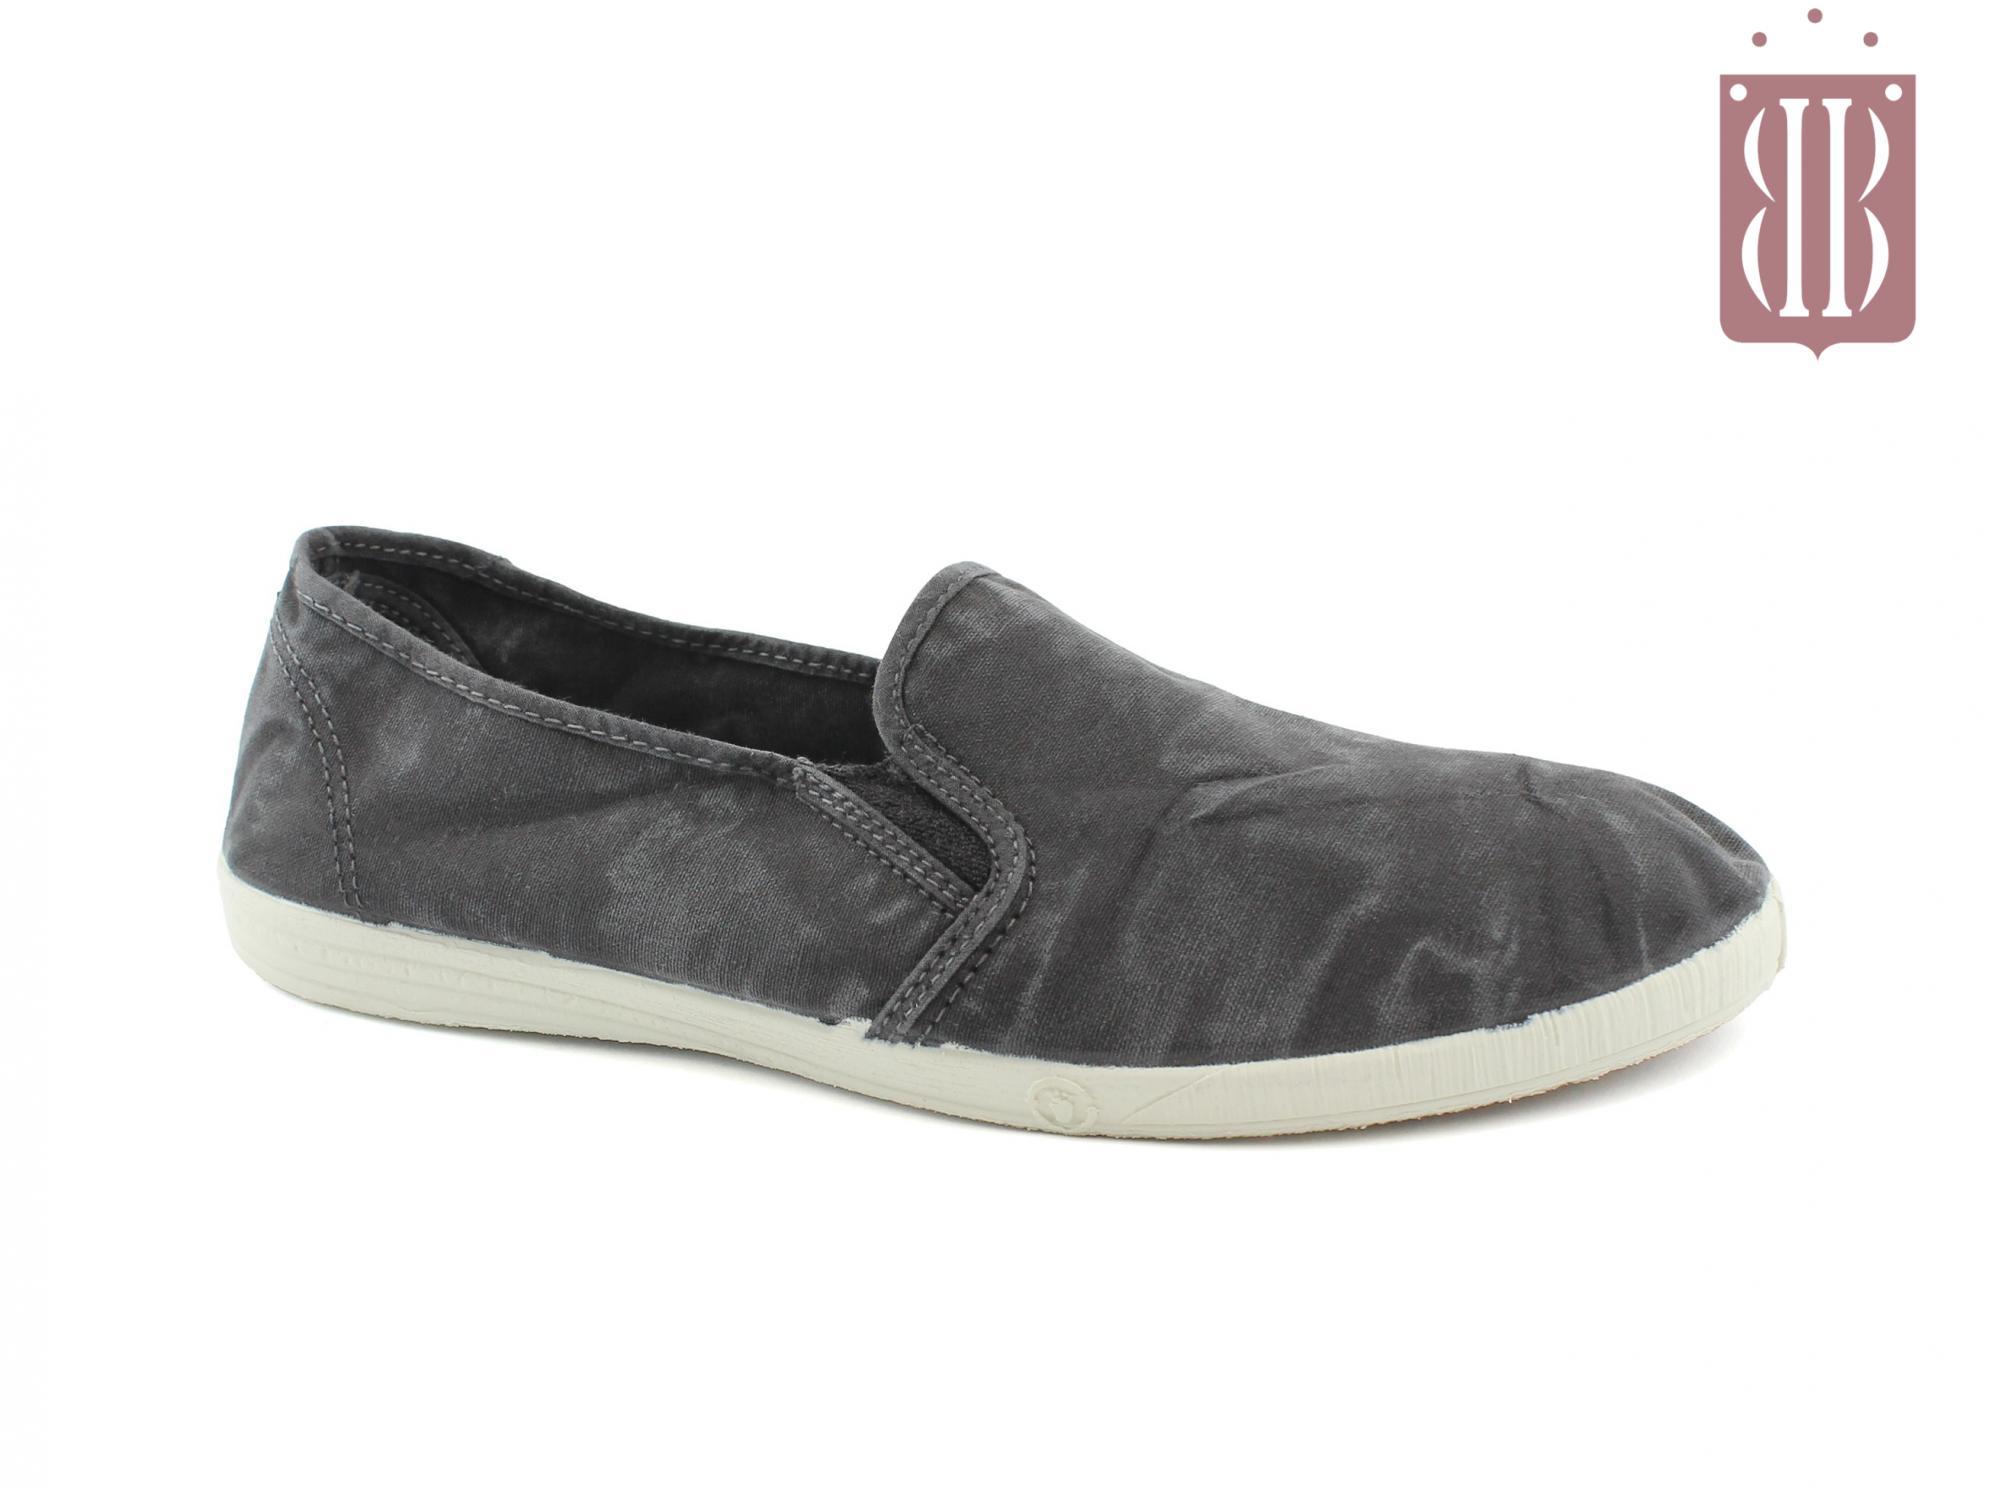 quality design 2d978 d17c2 NATURAL WORLD scarpe Donna Slip on Elastico Cotone Bio plantare estraibile  vegan shoes